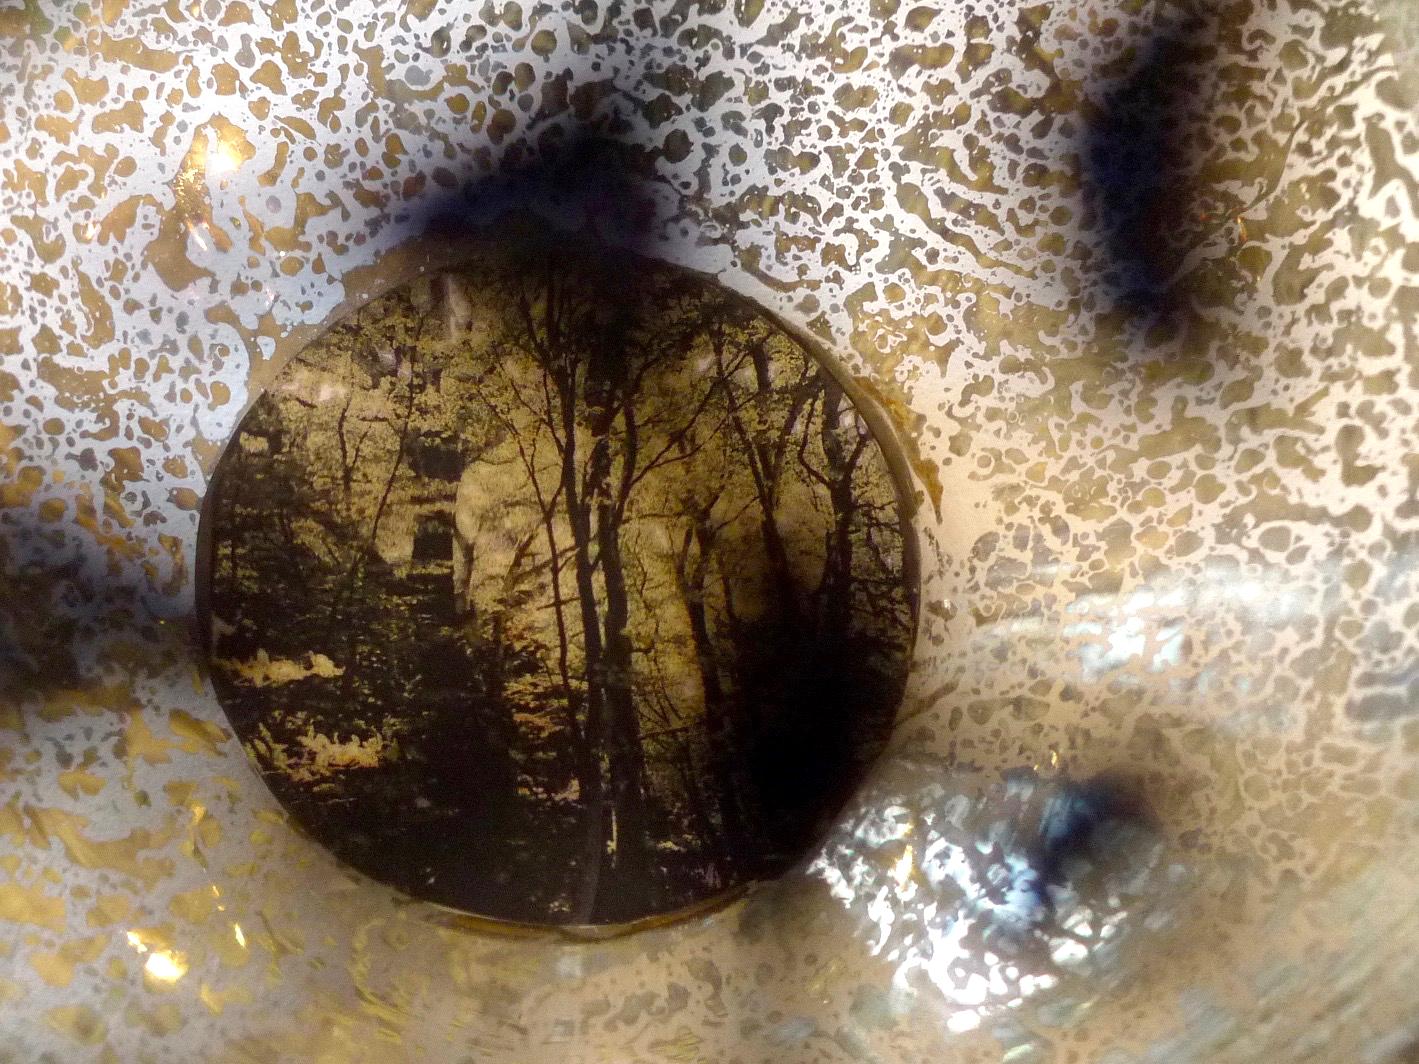 carita-savolainen-future-teller-crystal-ball-2-18cm-x-18cm-x-18cm-photo-and-glass-2016